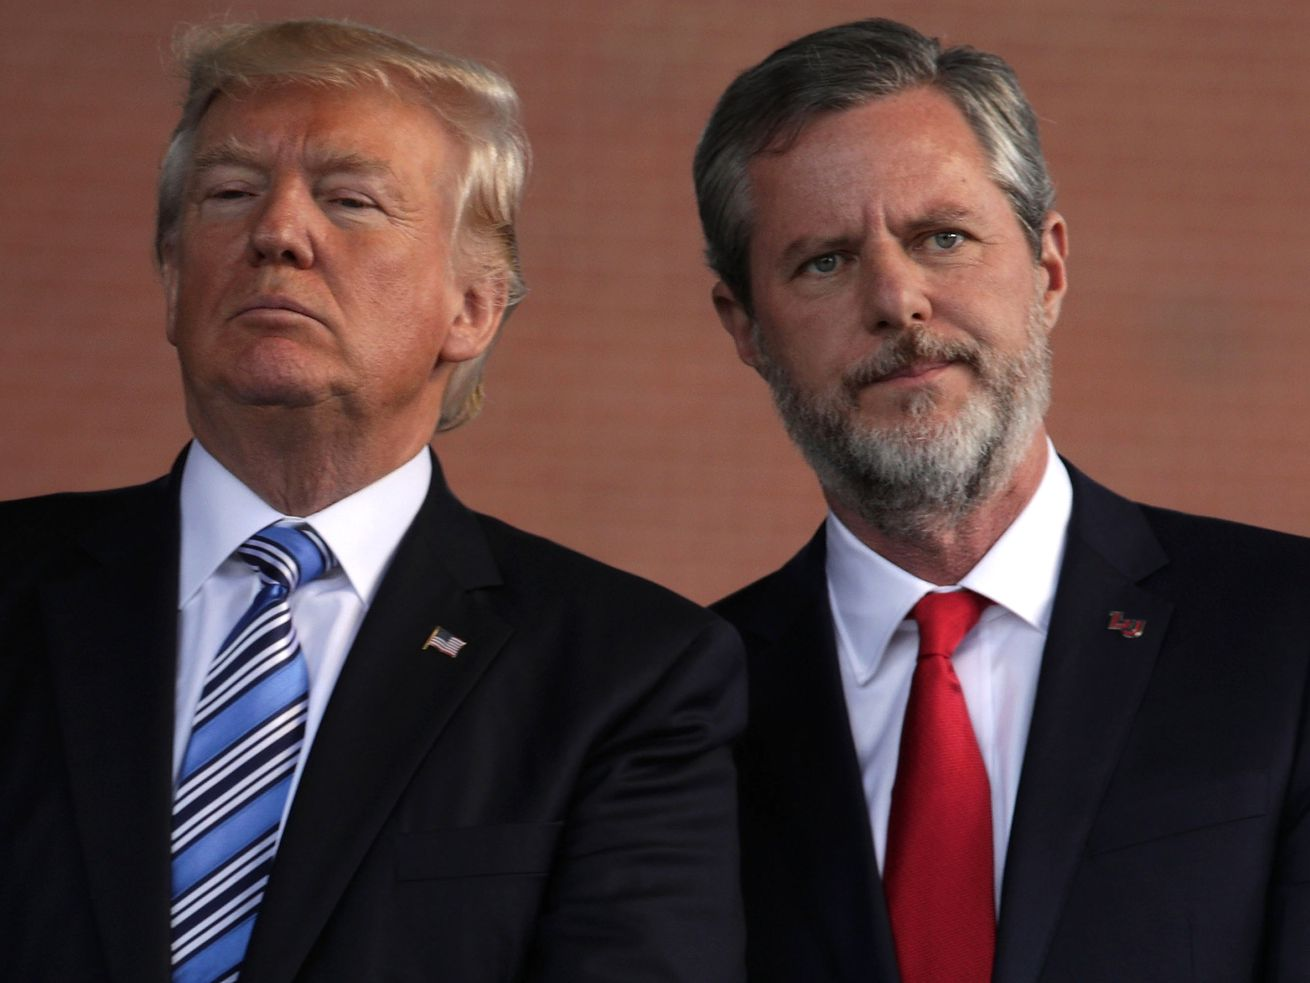 Jerry Falwell Jr. is a longtime Trump ally.